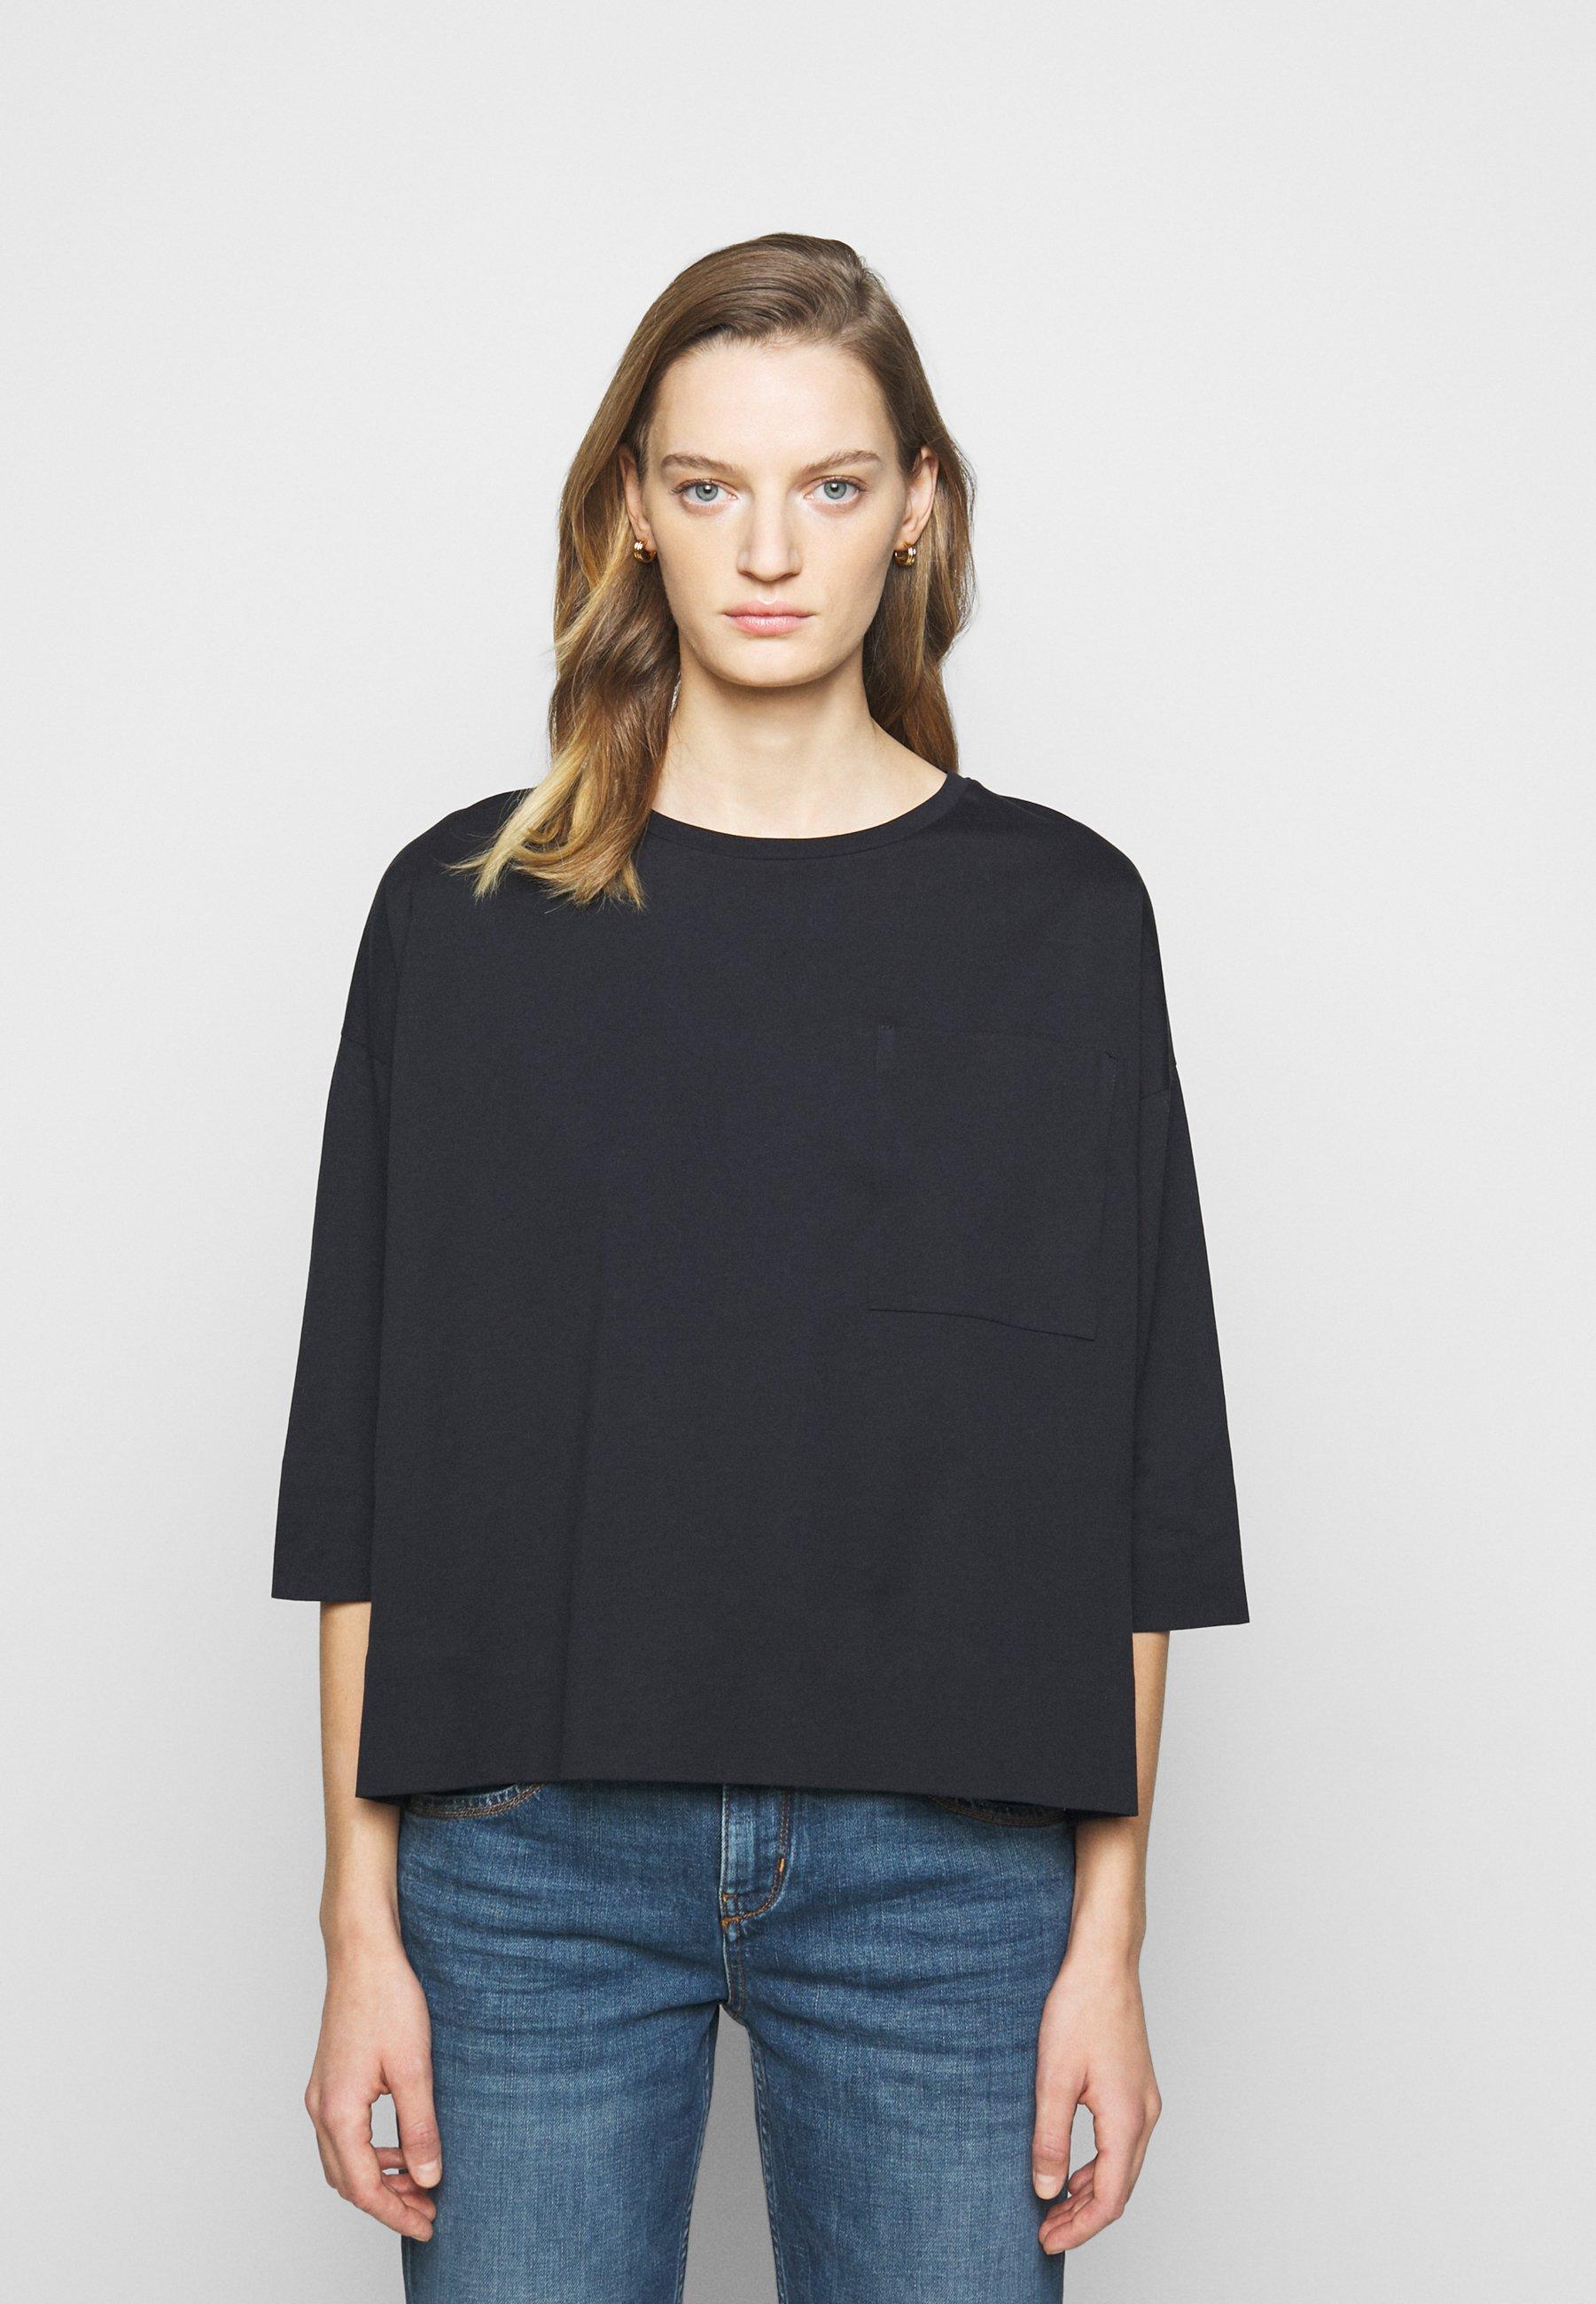 Femme KAORI - T-shirt à manches longues